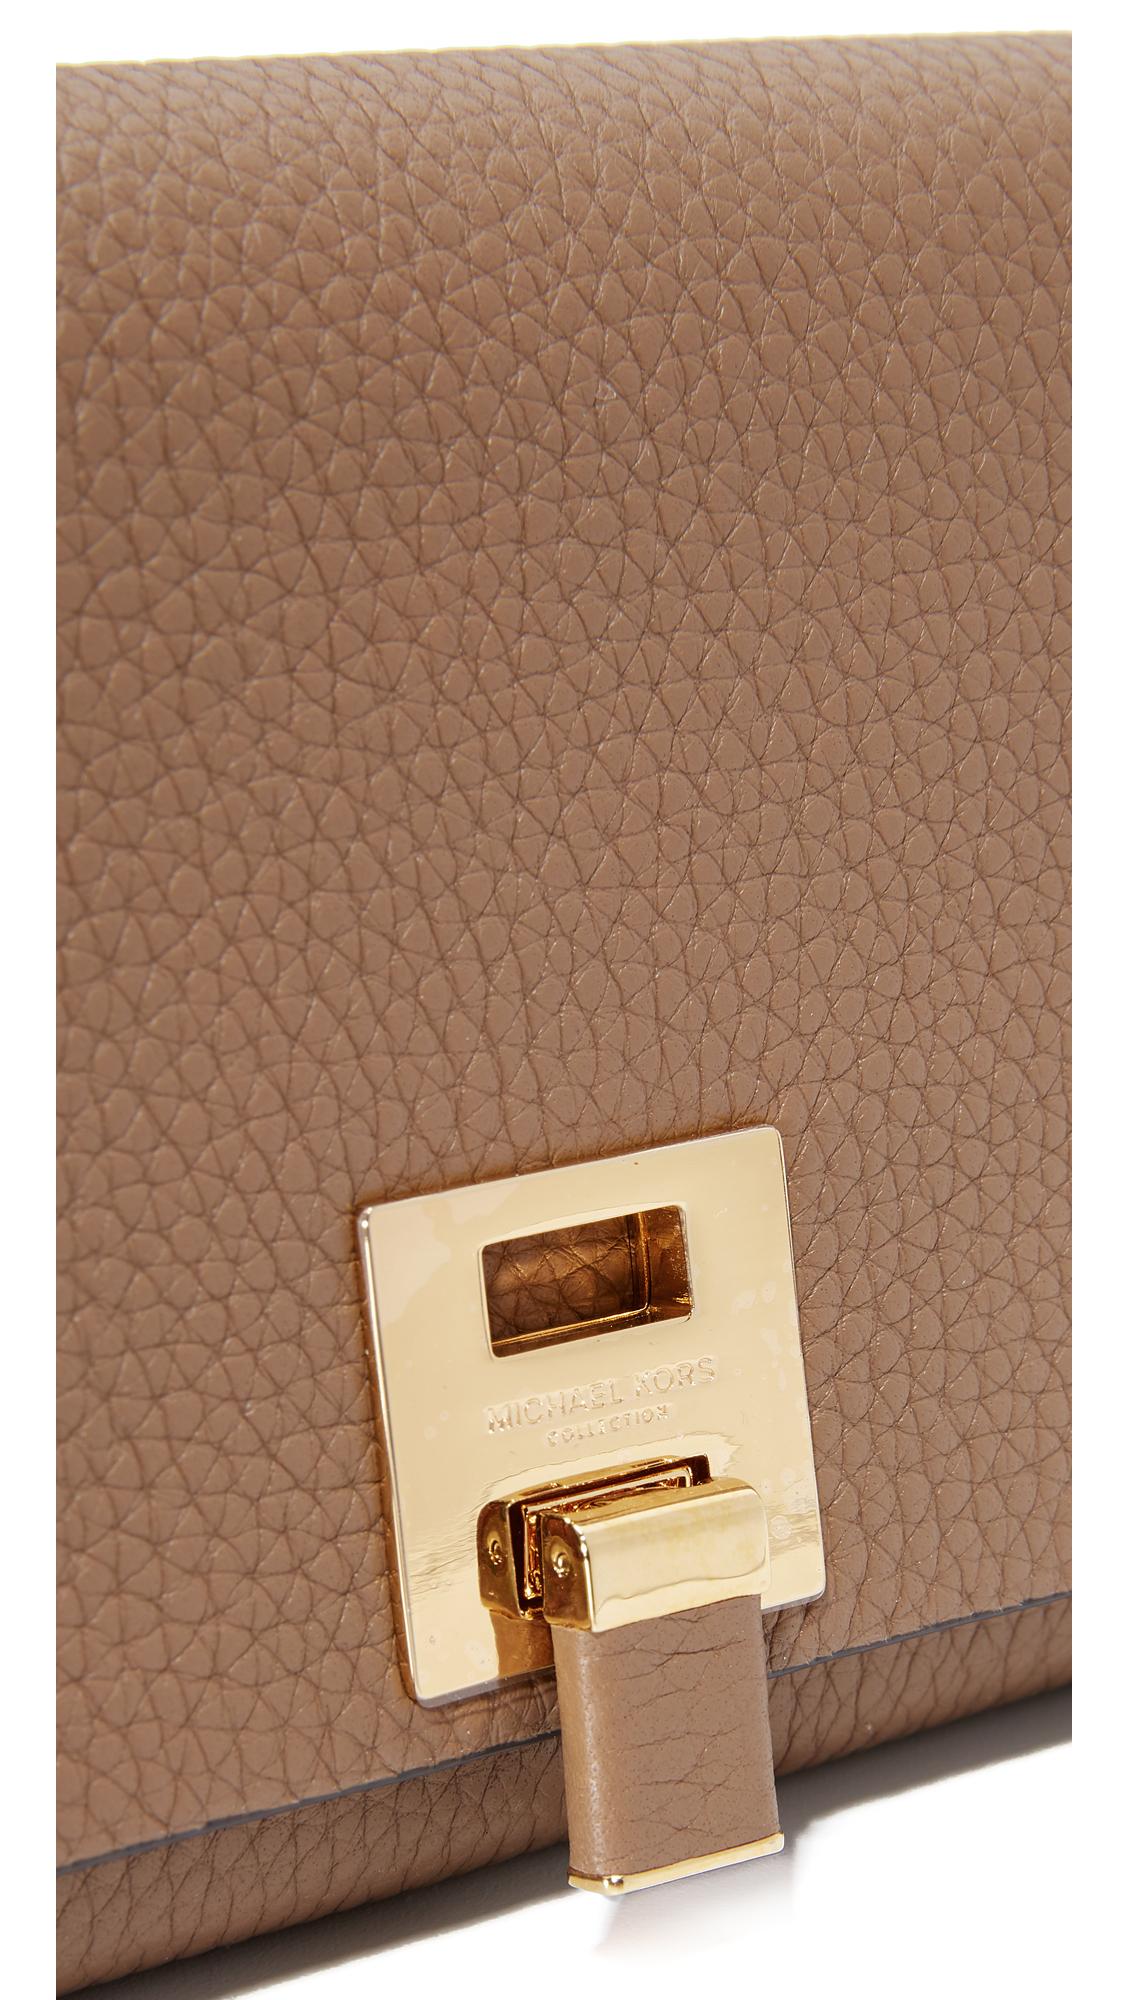 ddf87ae1fd7dd9 Michael Kors Collection Bancroft Continental Wallet | SHOPBOP